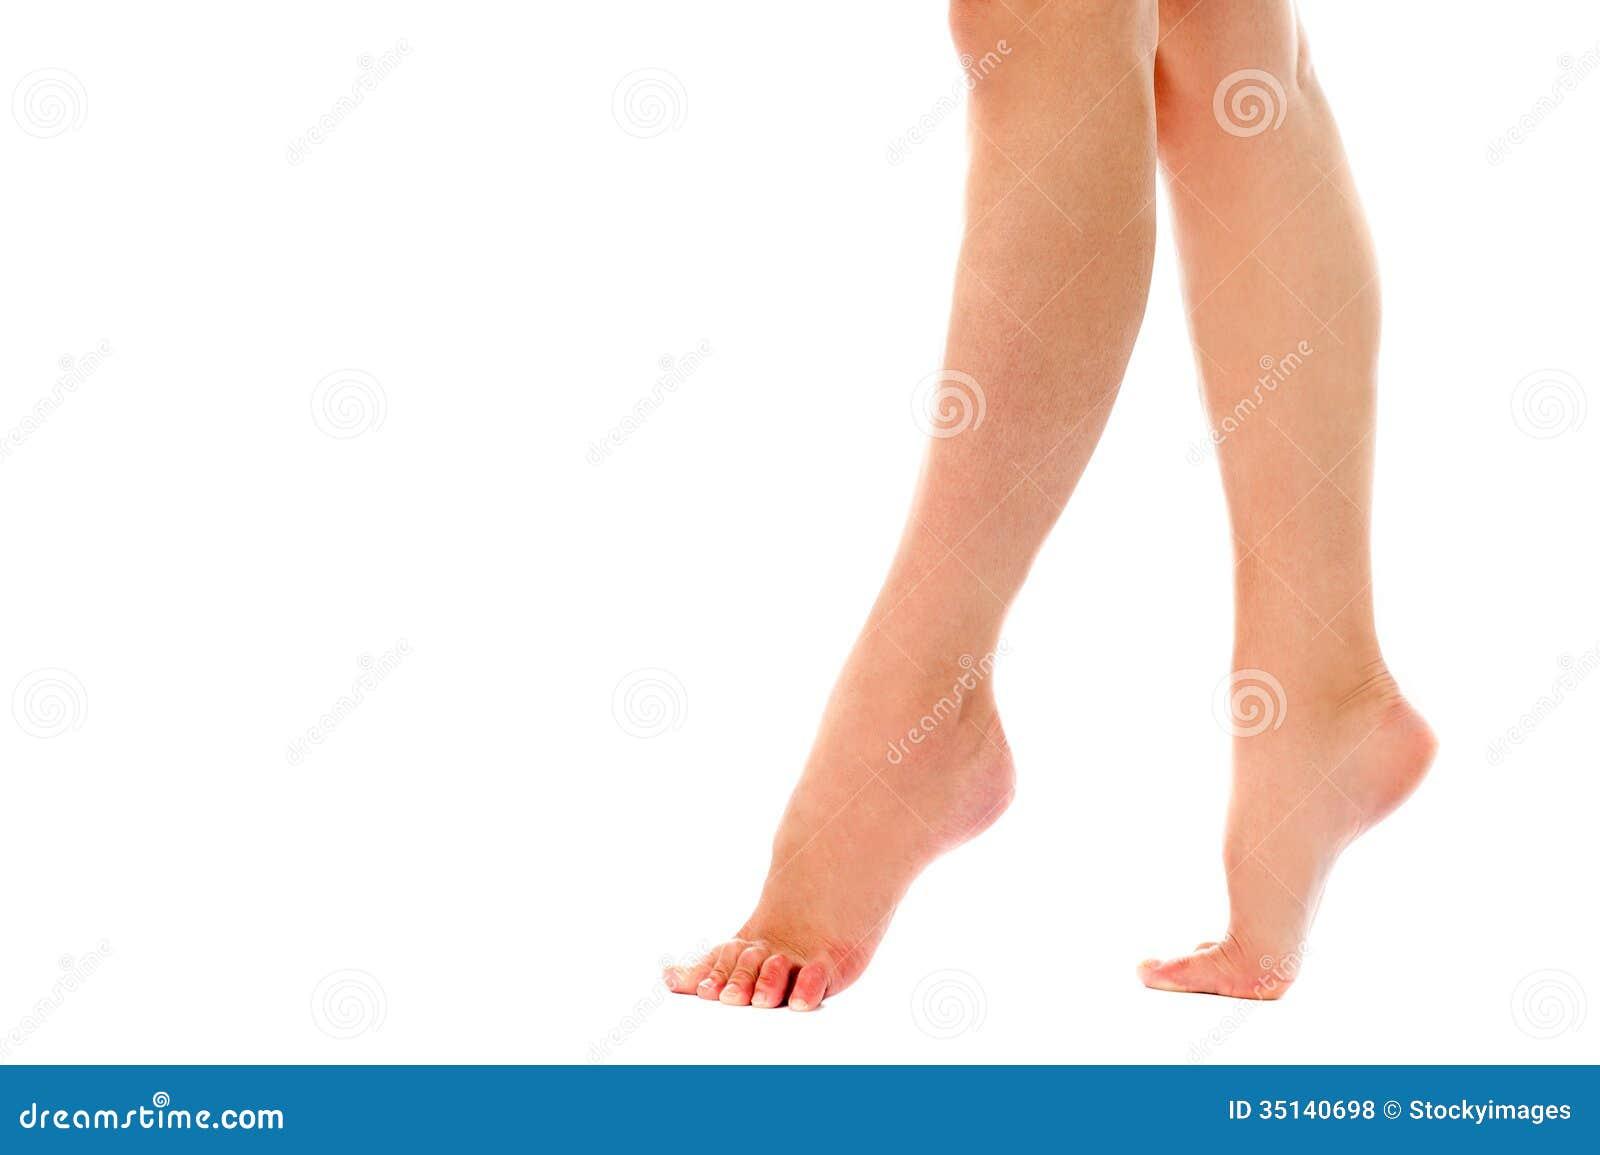 Woman Walking On Toes Closeup Shot Royalty Free Stock